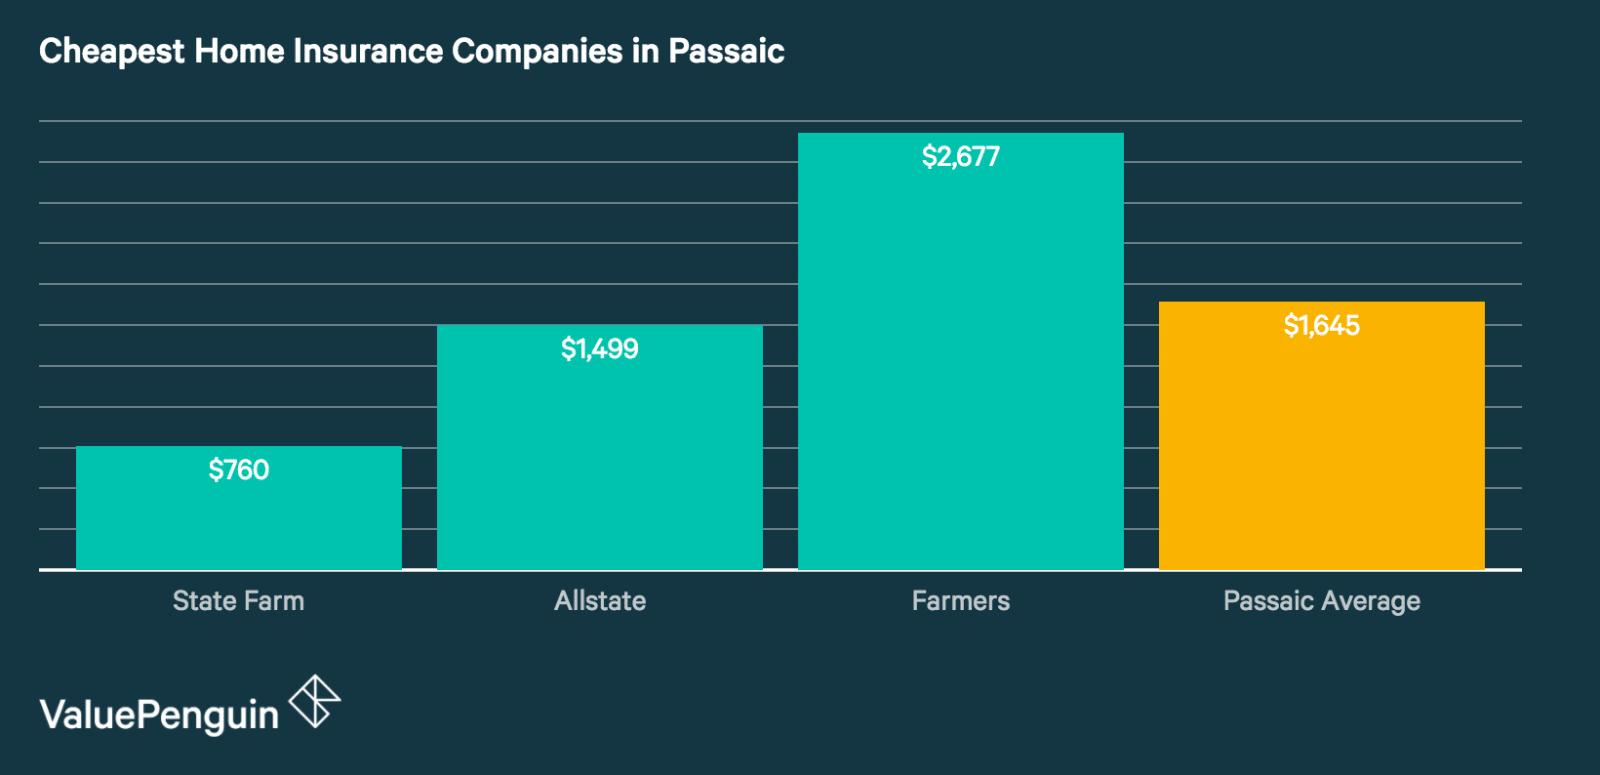 Best Cheap Home Insurance Companies in Passaic